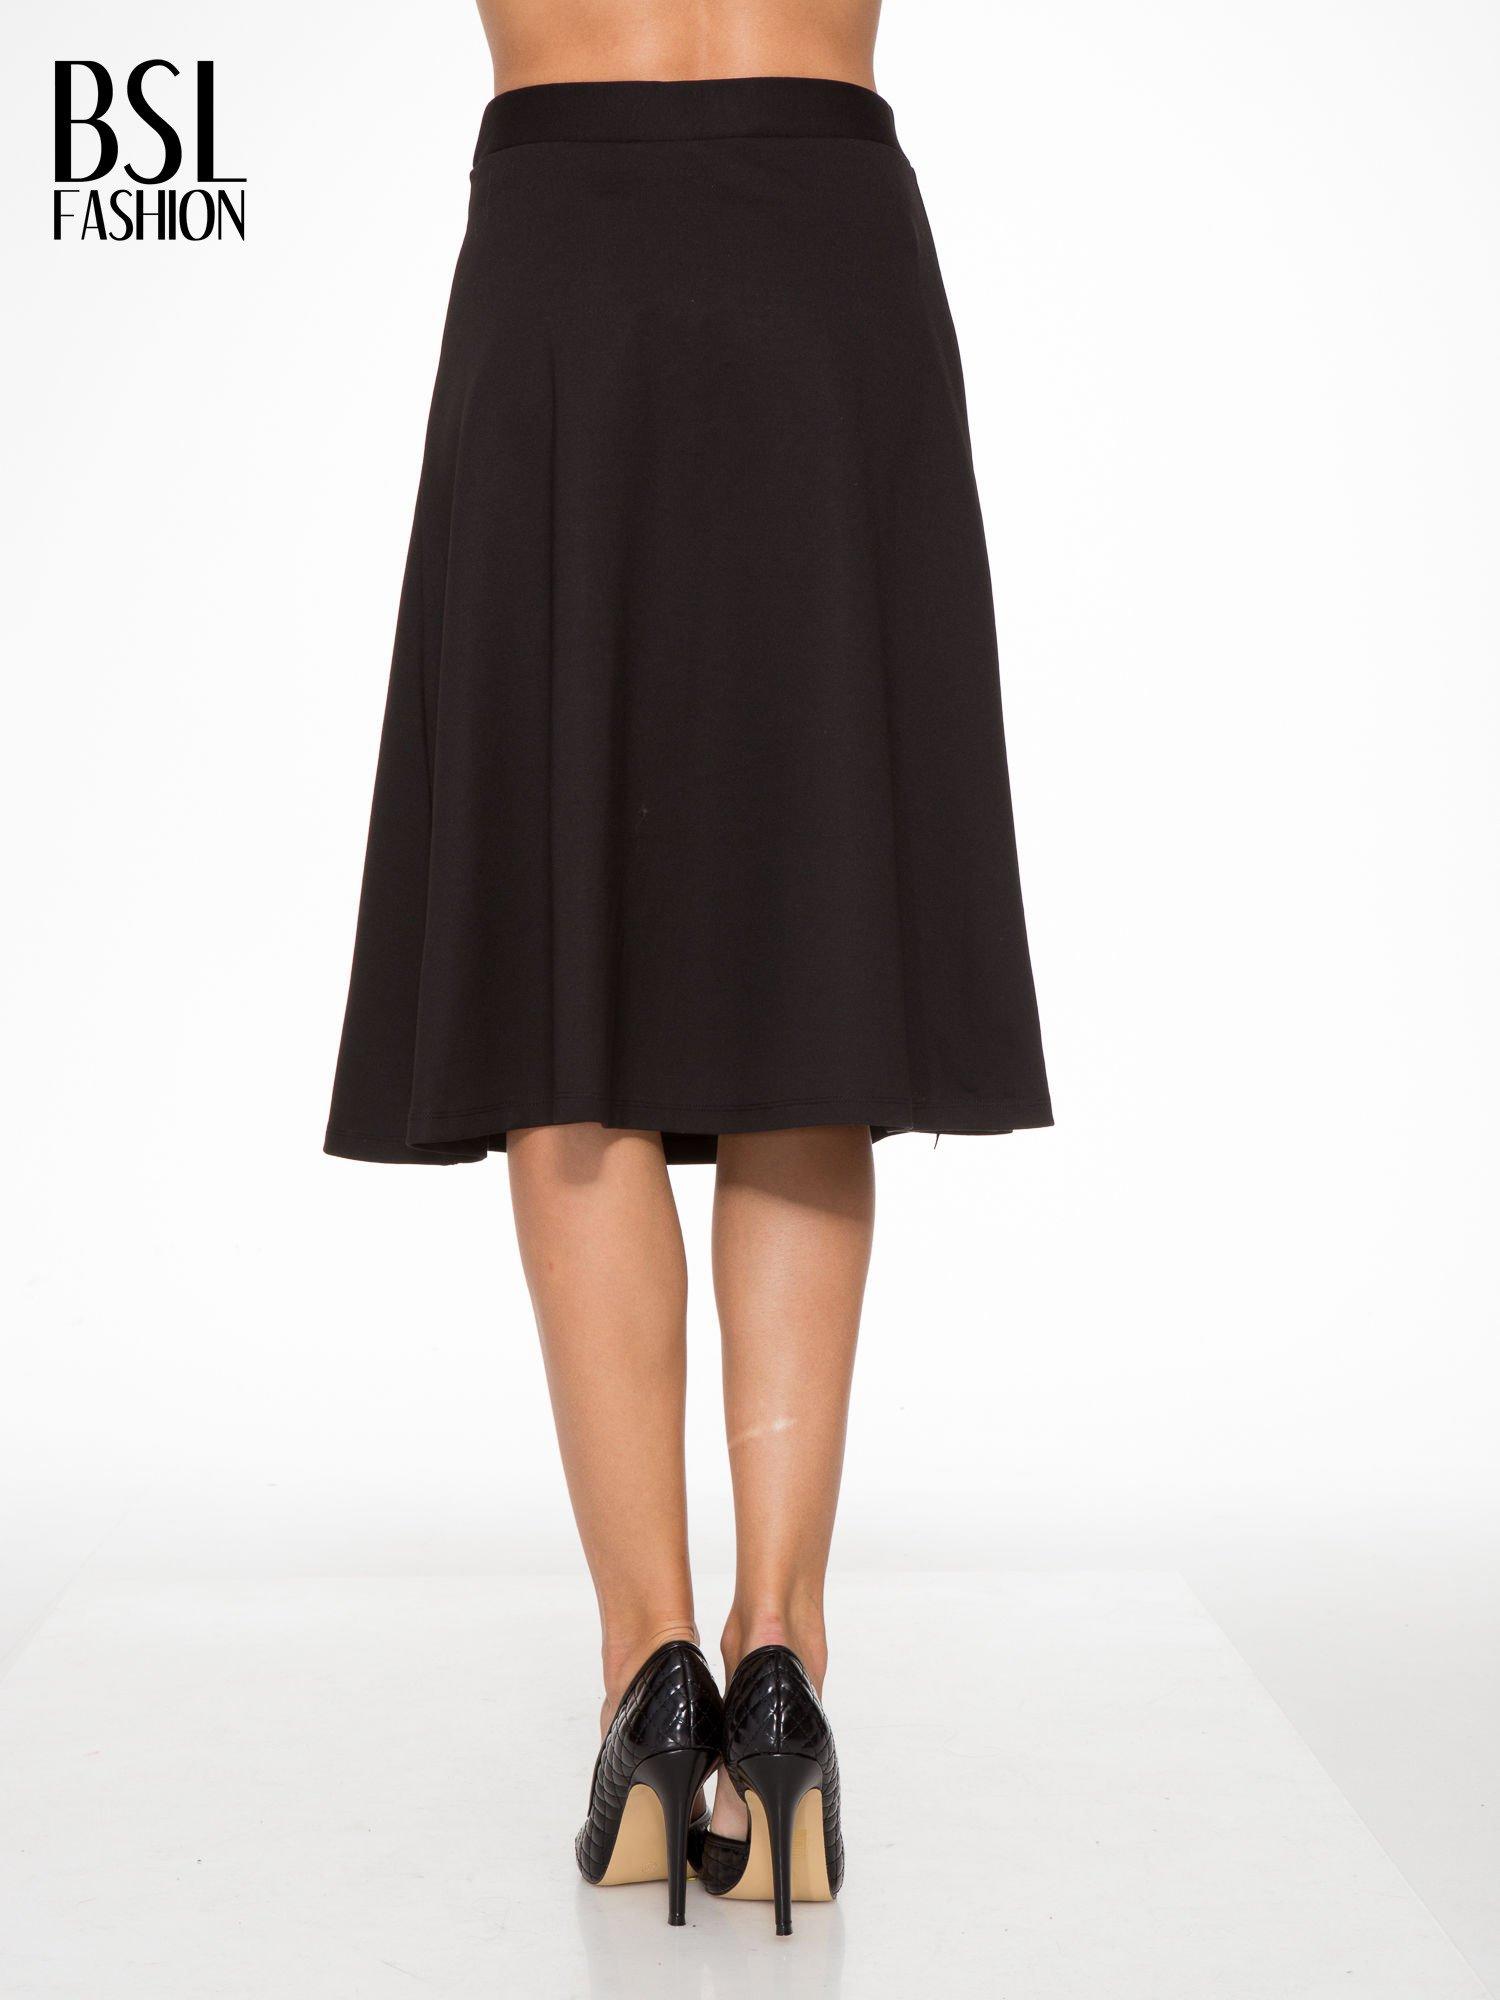 Czarna spódnica midi w kształcie litery A                                  zdj.                                  4